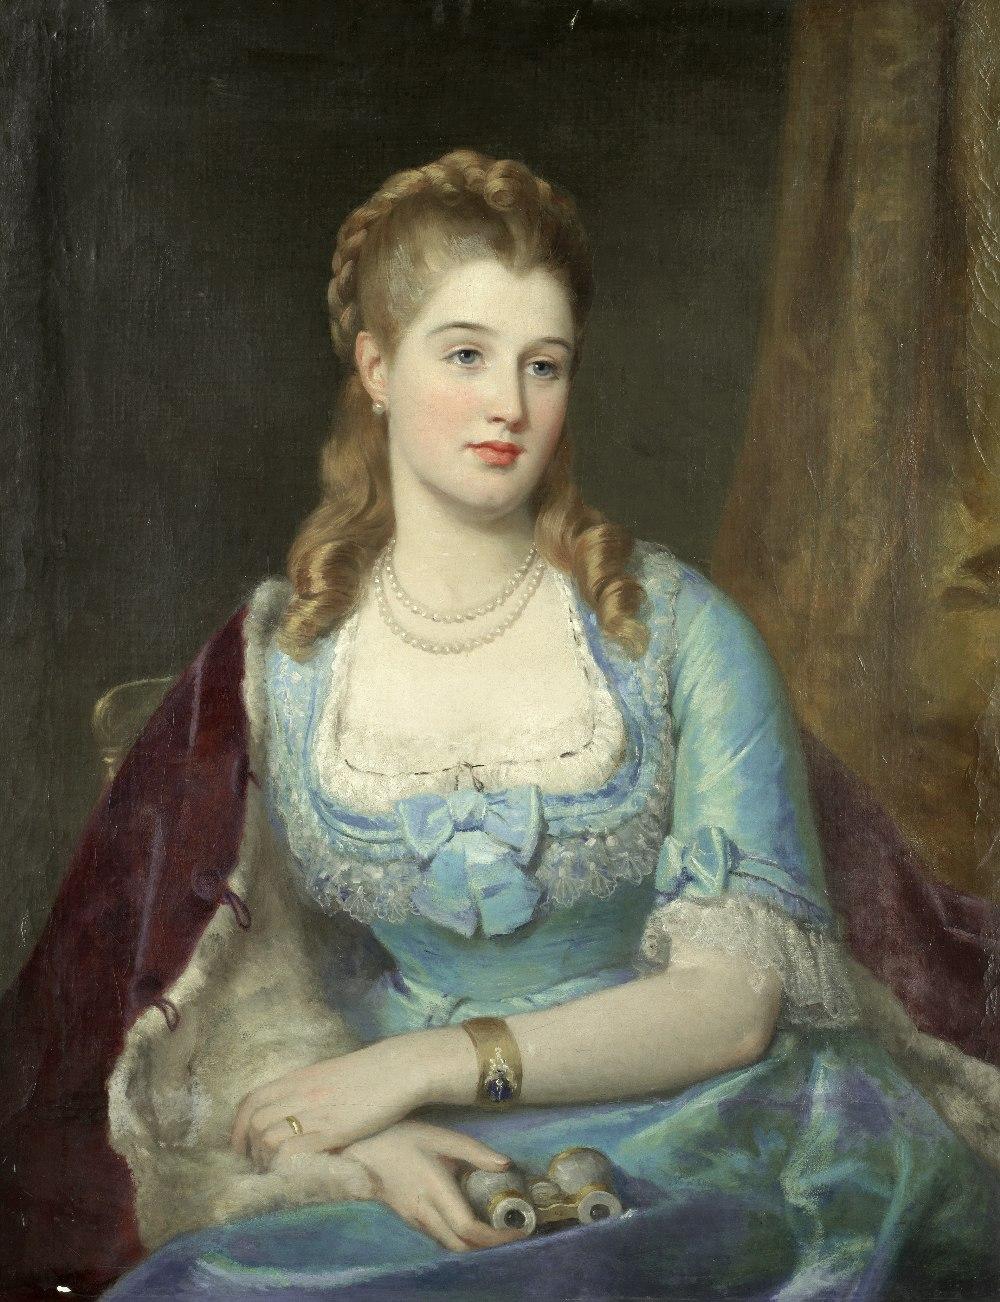 Lot 8 - Attributed to Charles Baxter (British, 1809-1879) At the opera